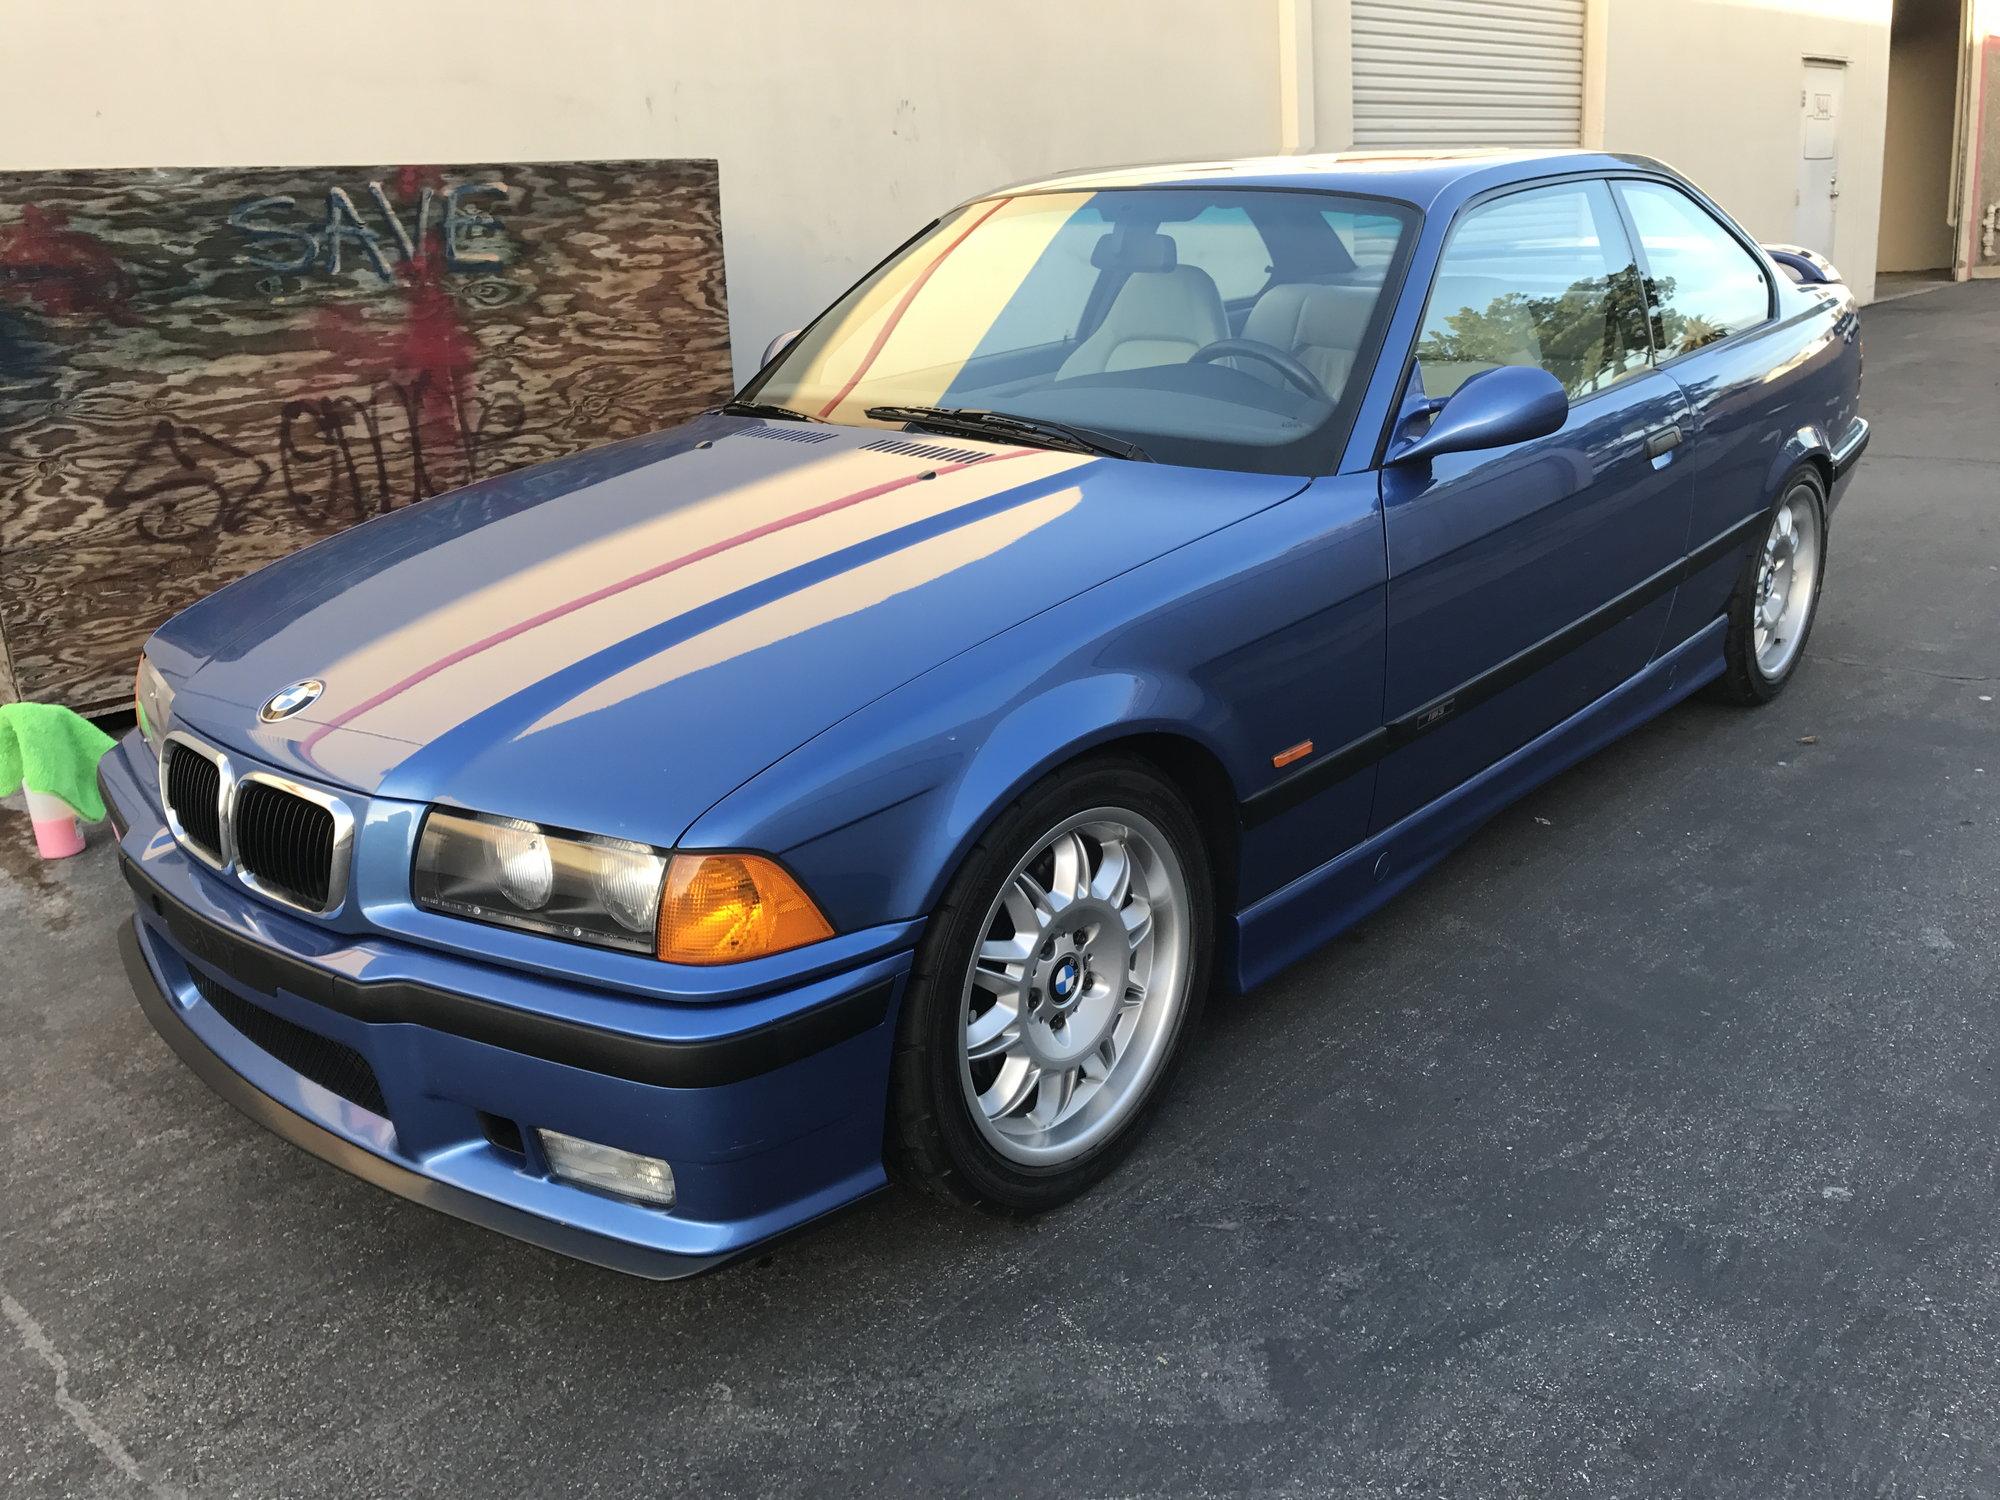 1997 BMW M3 Coupe 5 Speed One Owner 67k miles Estoril Blue ...